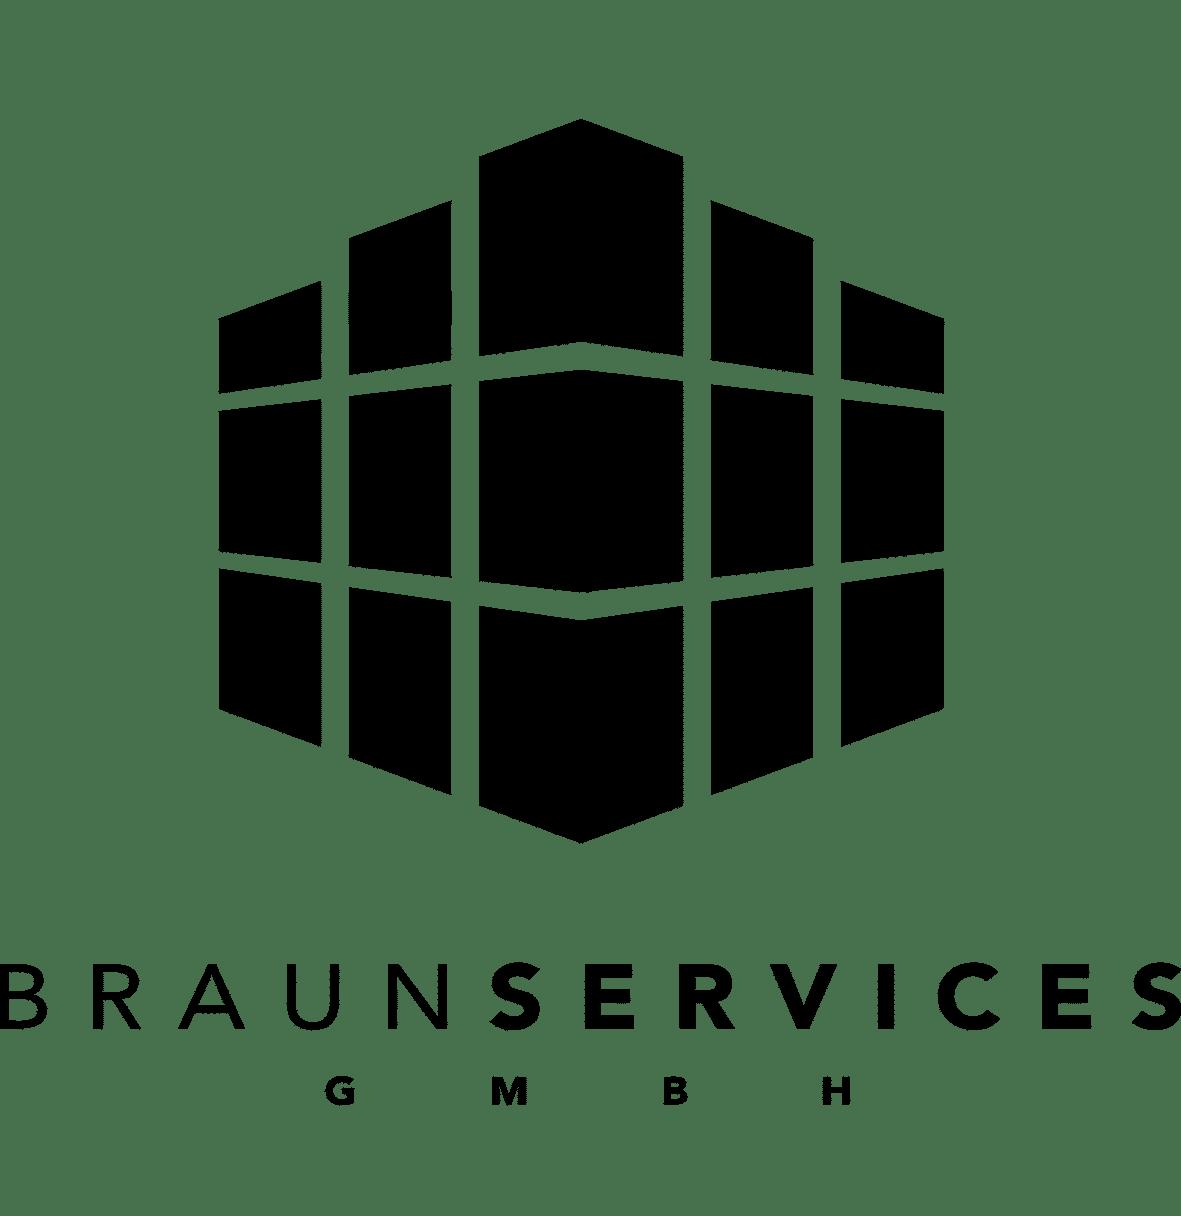 Braun Services GmbH